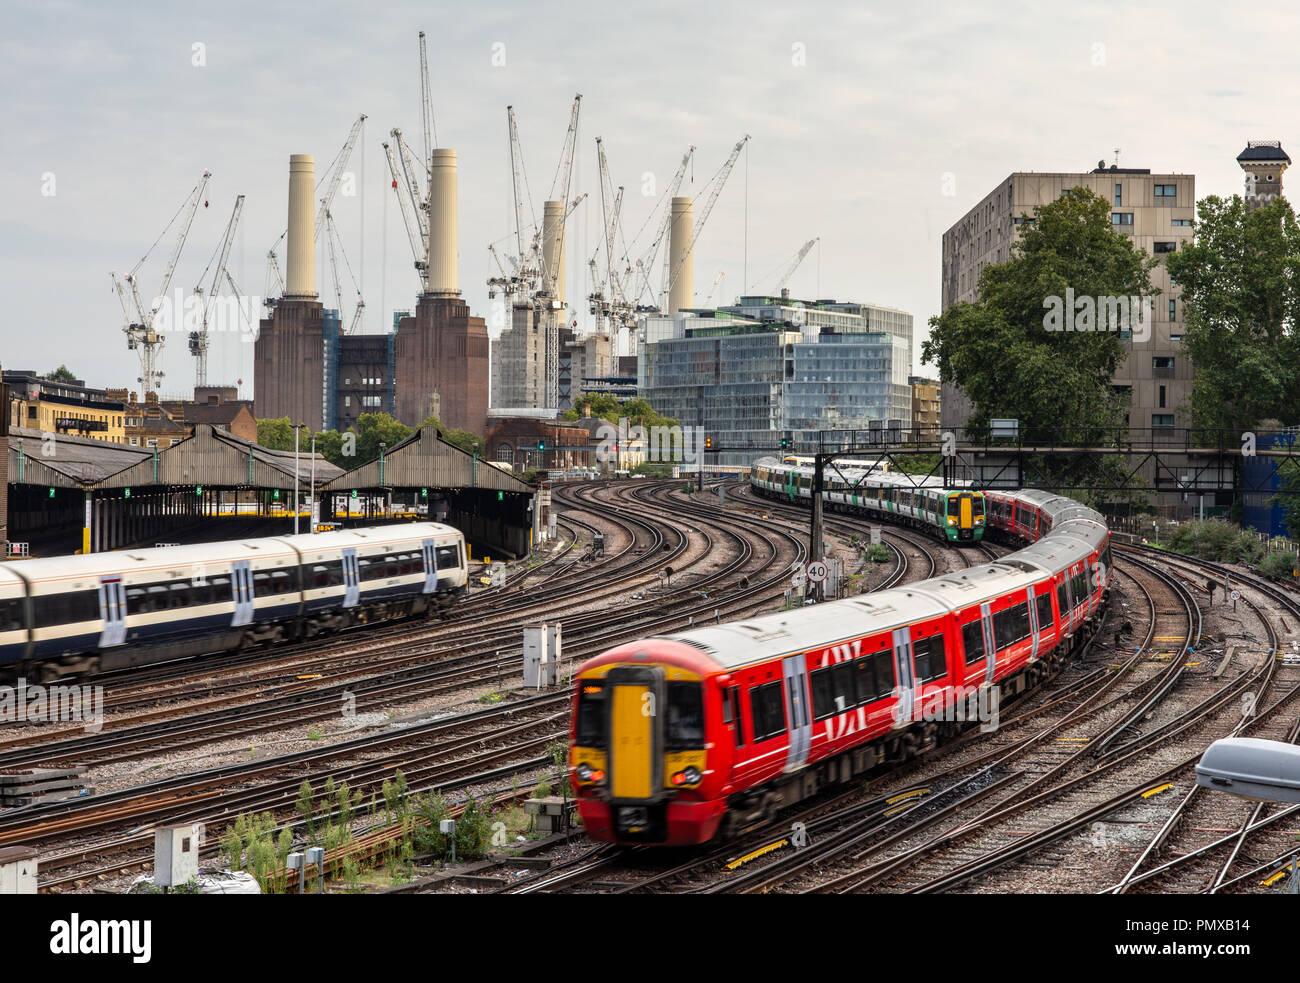 London, England, UK - September 5, 2018: Southern, Southeastern and Gatwick Express commuter passenger trains pass outside London's Victoria station w - Stock Image